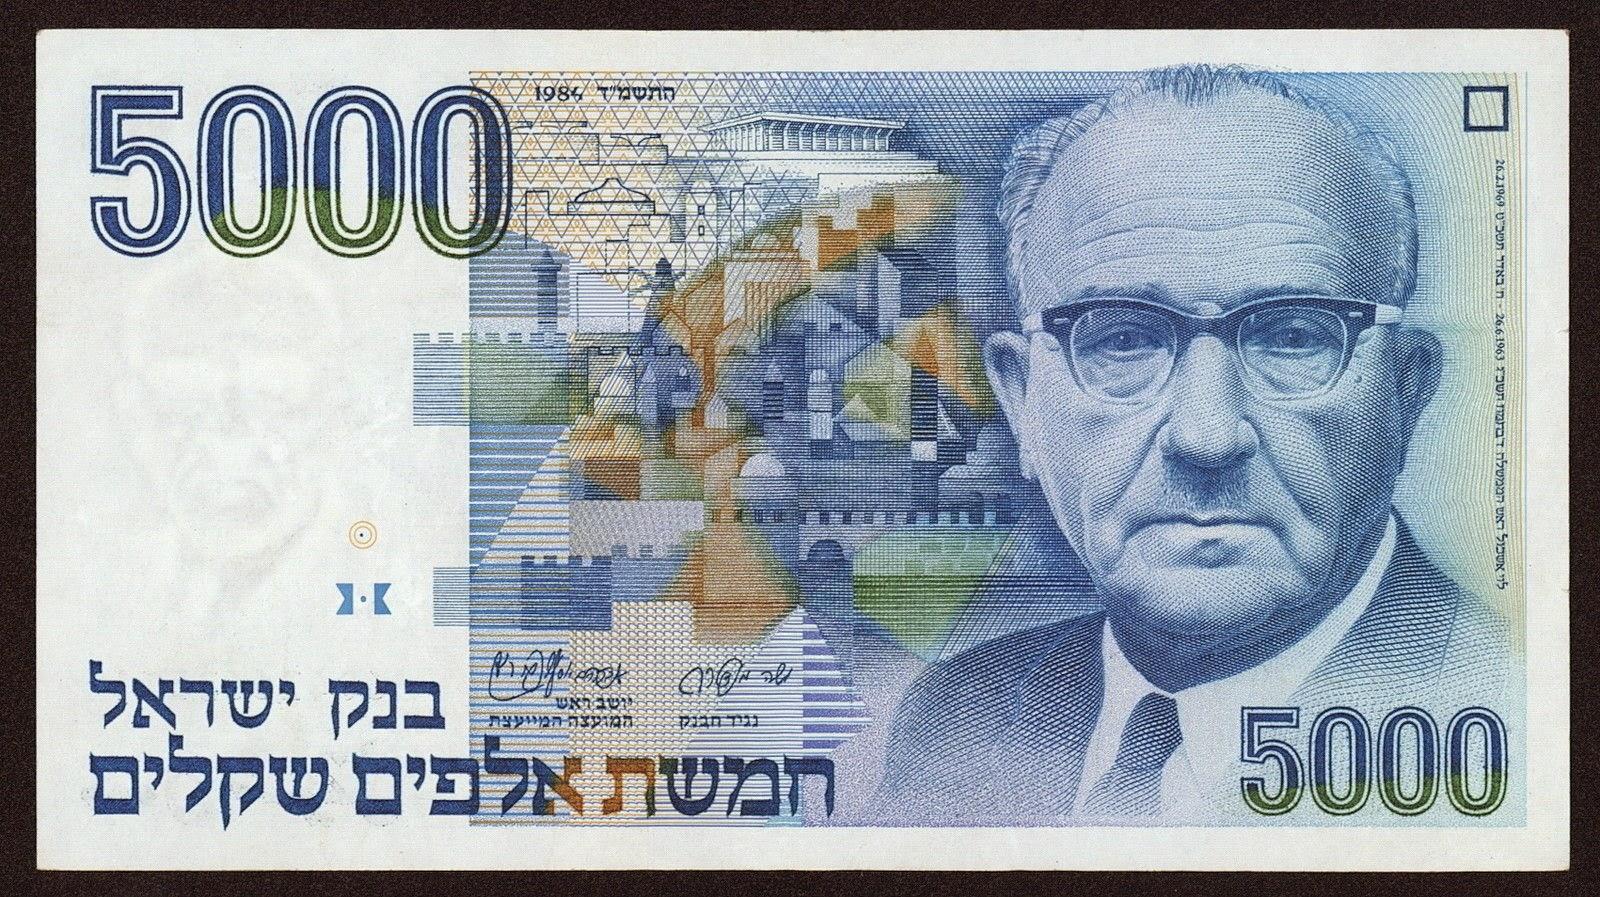 Israel 5000 Sheqalim banknote 1984 Levi Eshkol